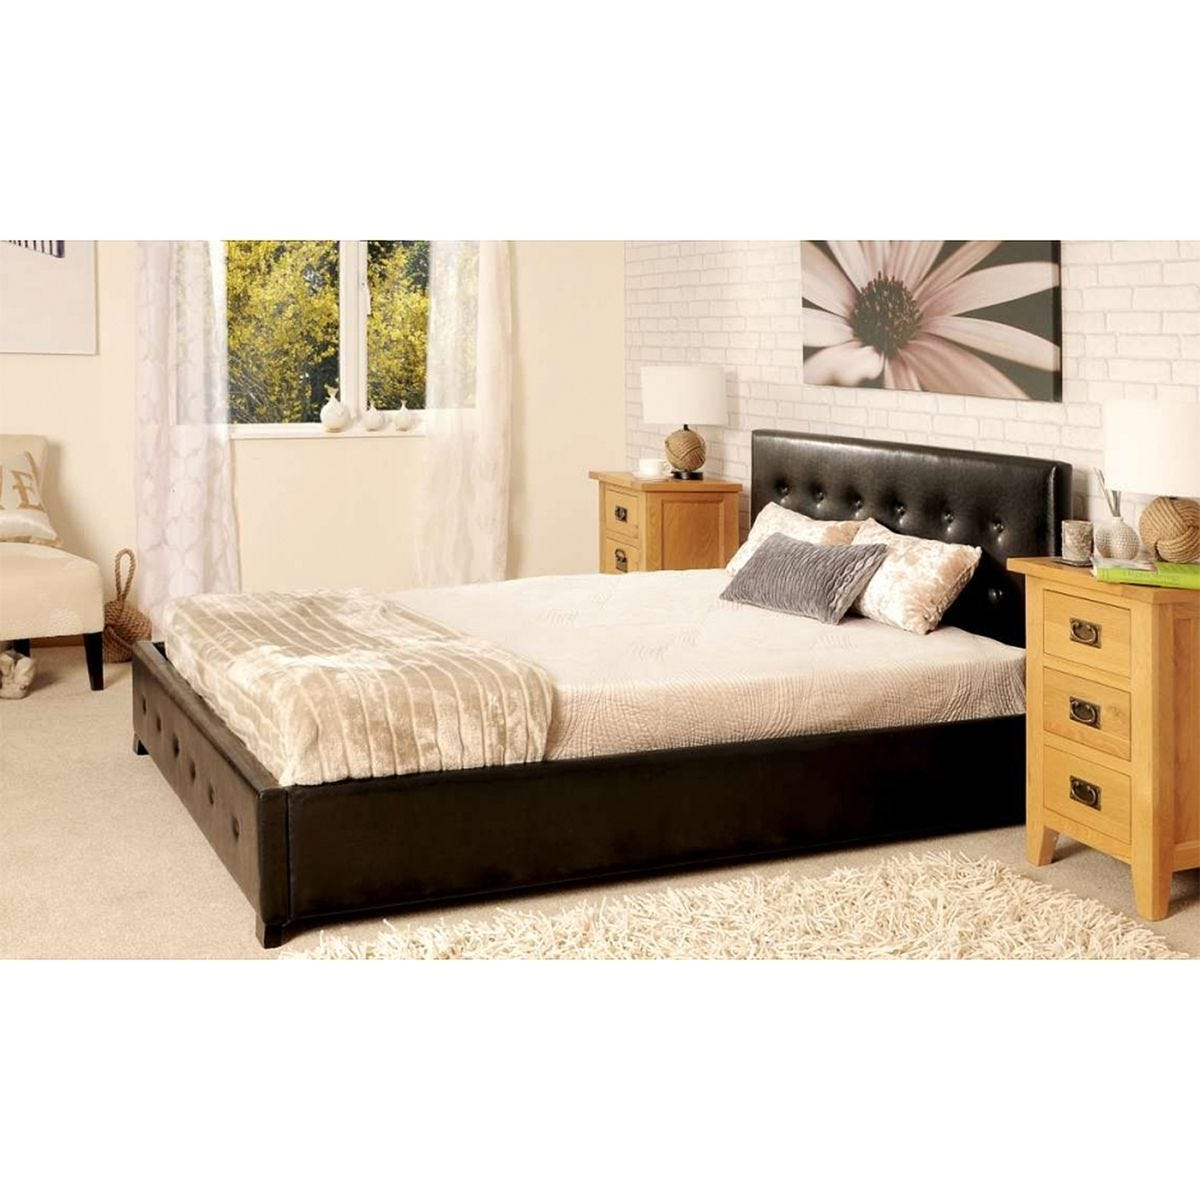 Lincoln Ottoman Storage Bed - Black